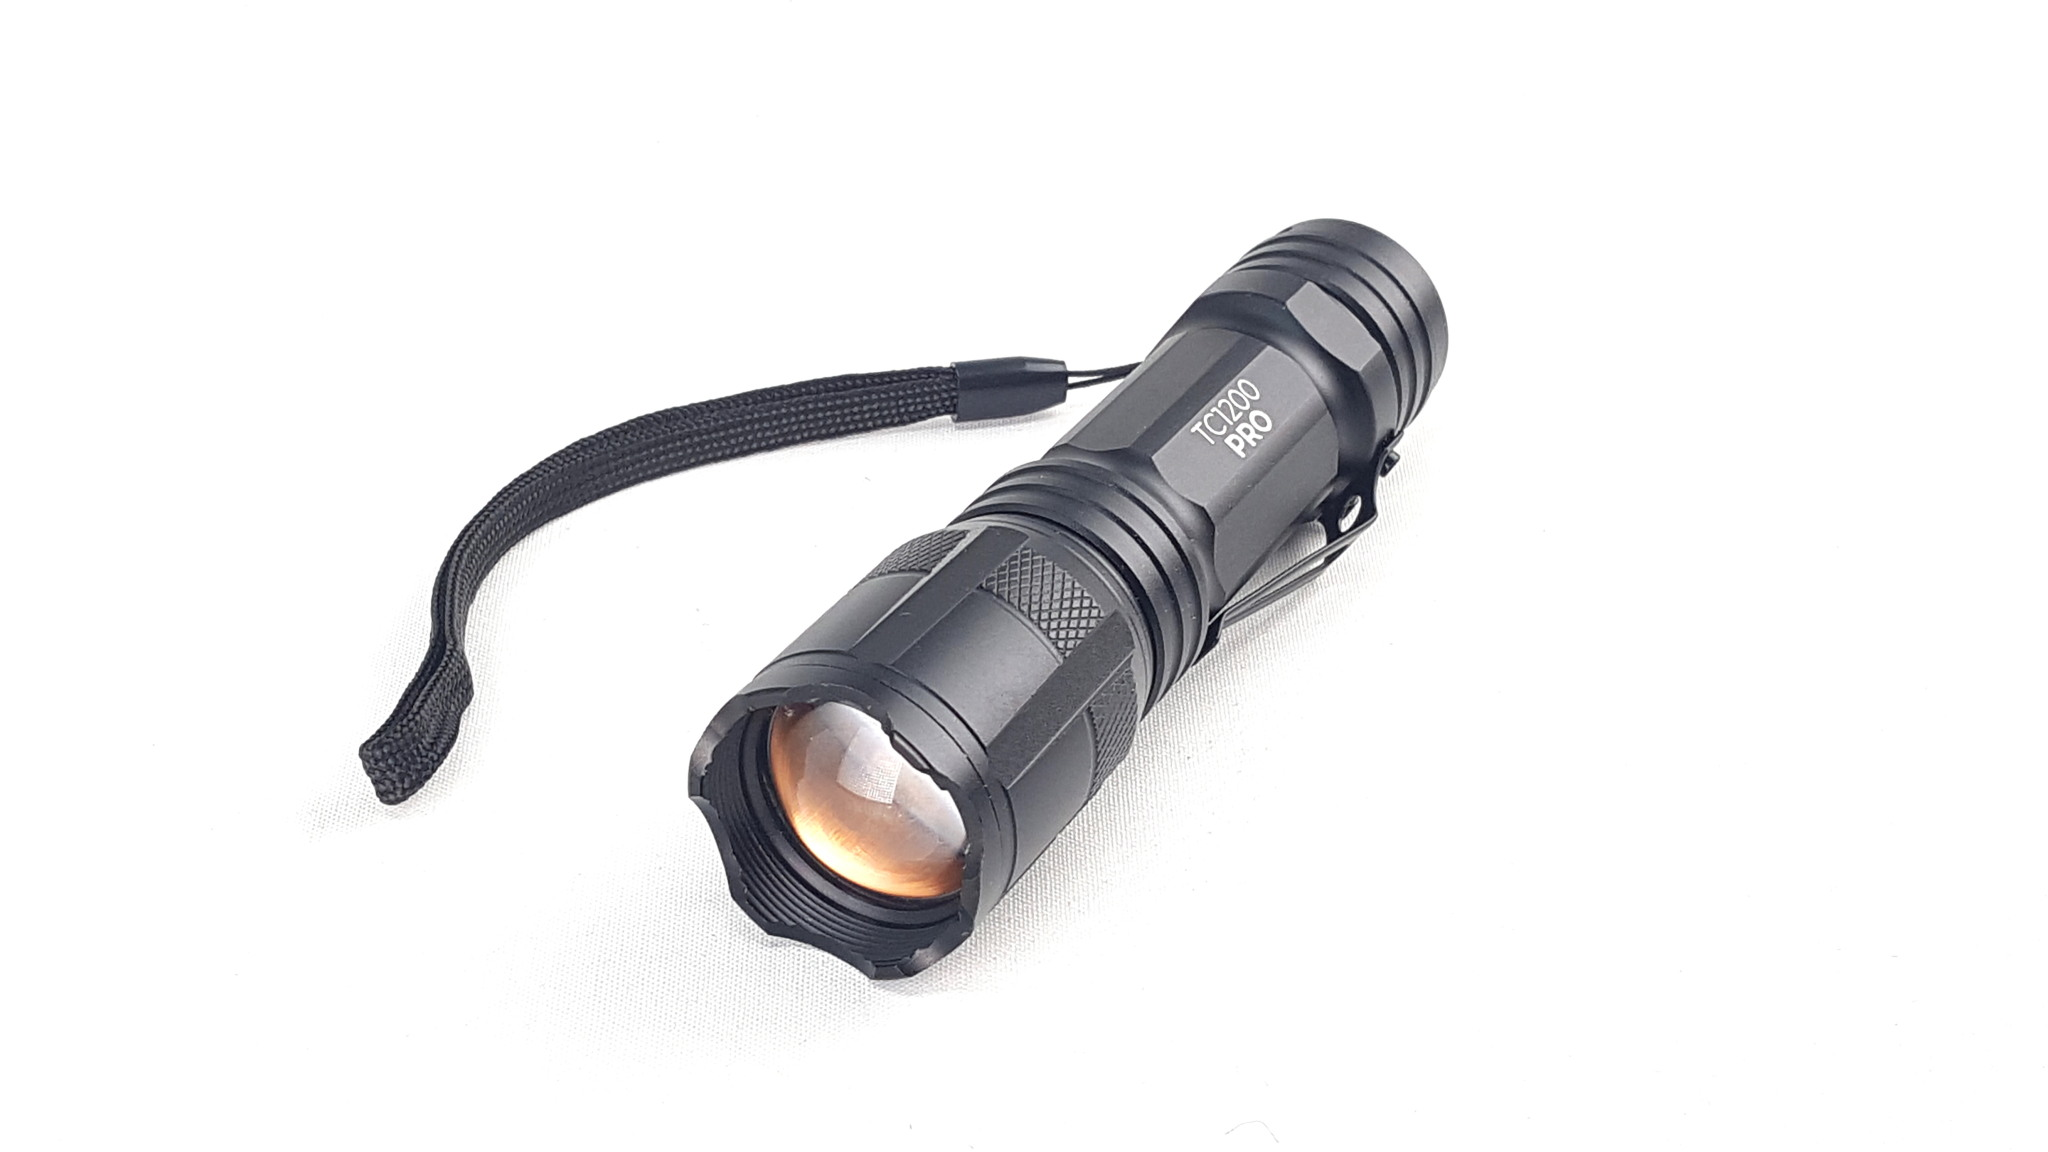 1TAC TC1200 Tactical Flashlights with Real CREE XM-L2 LED